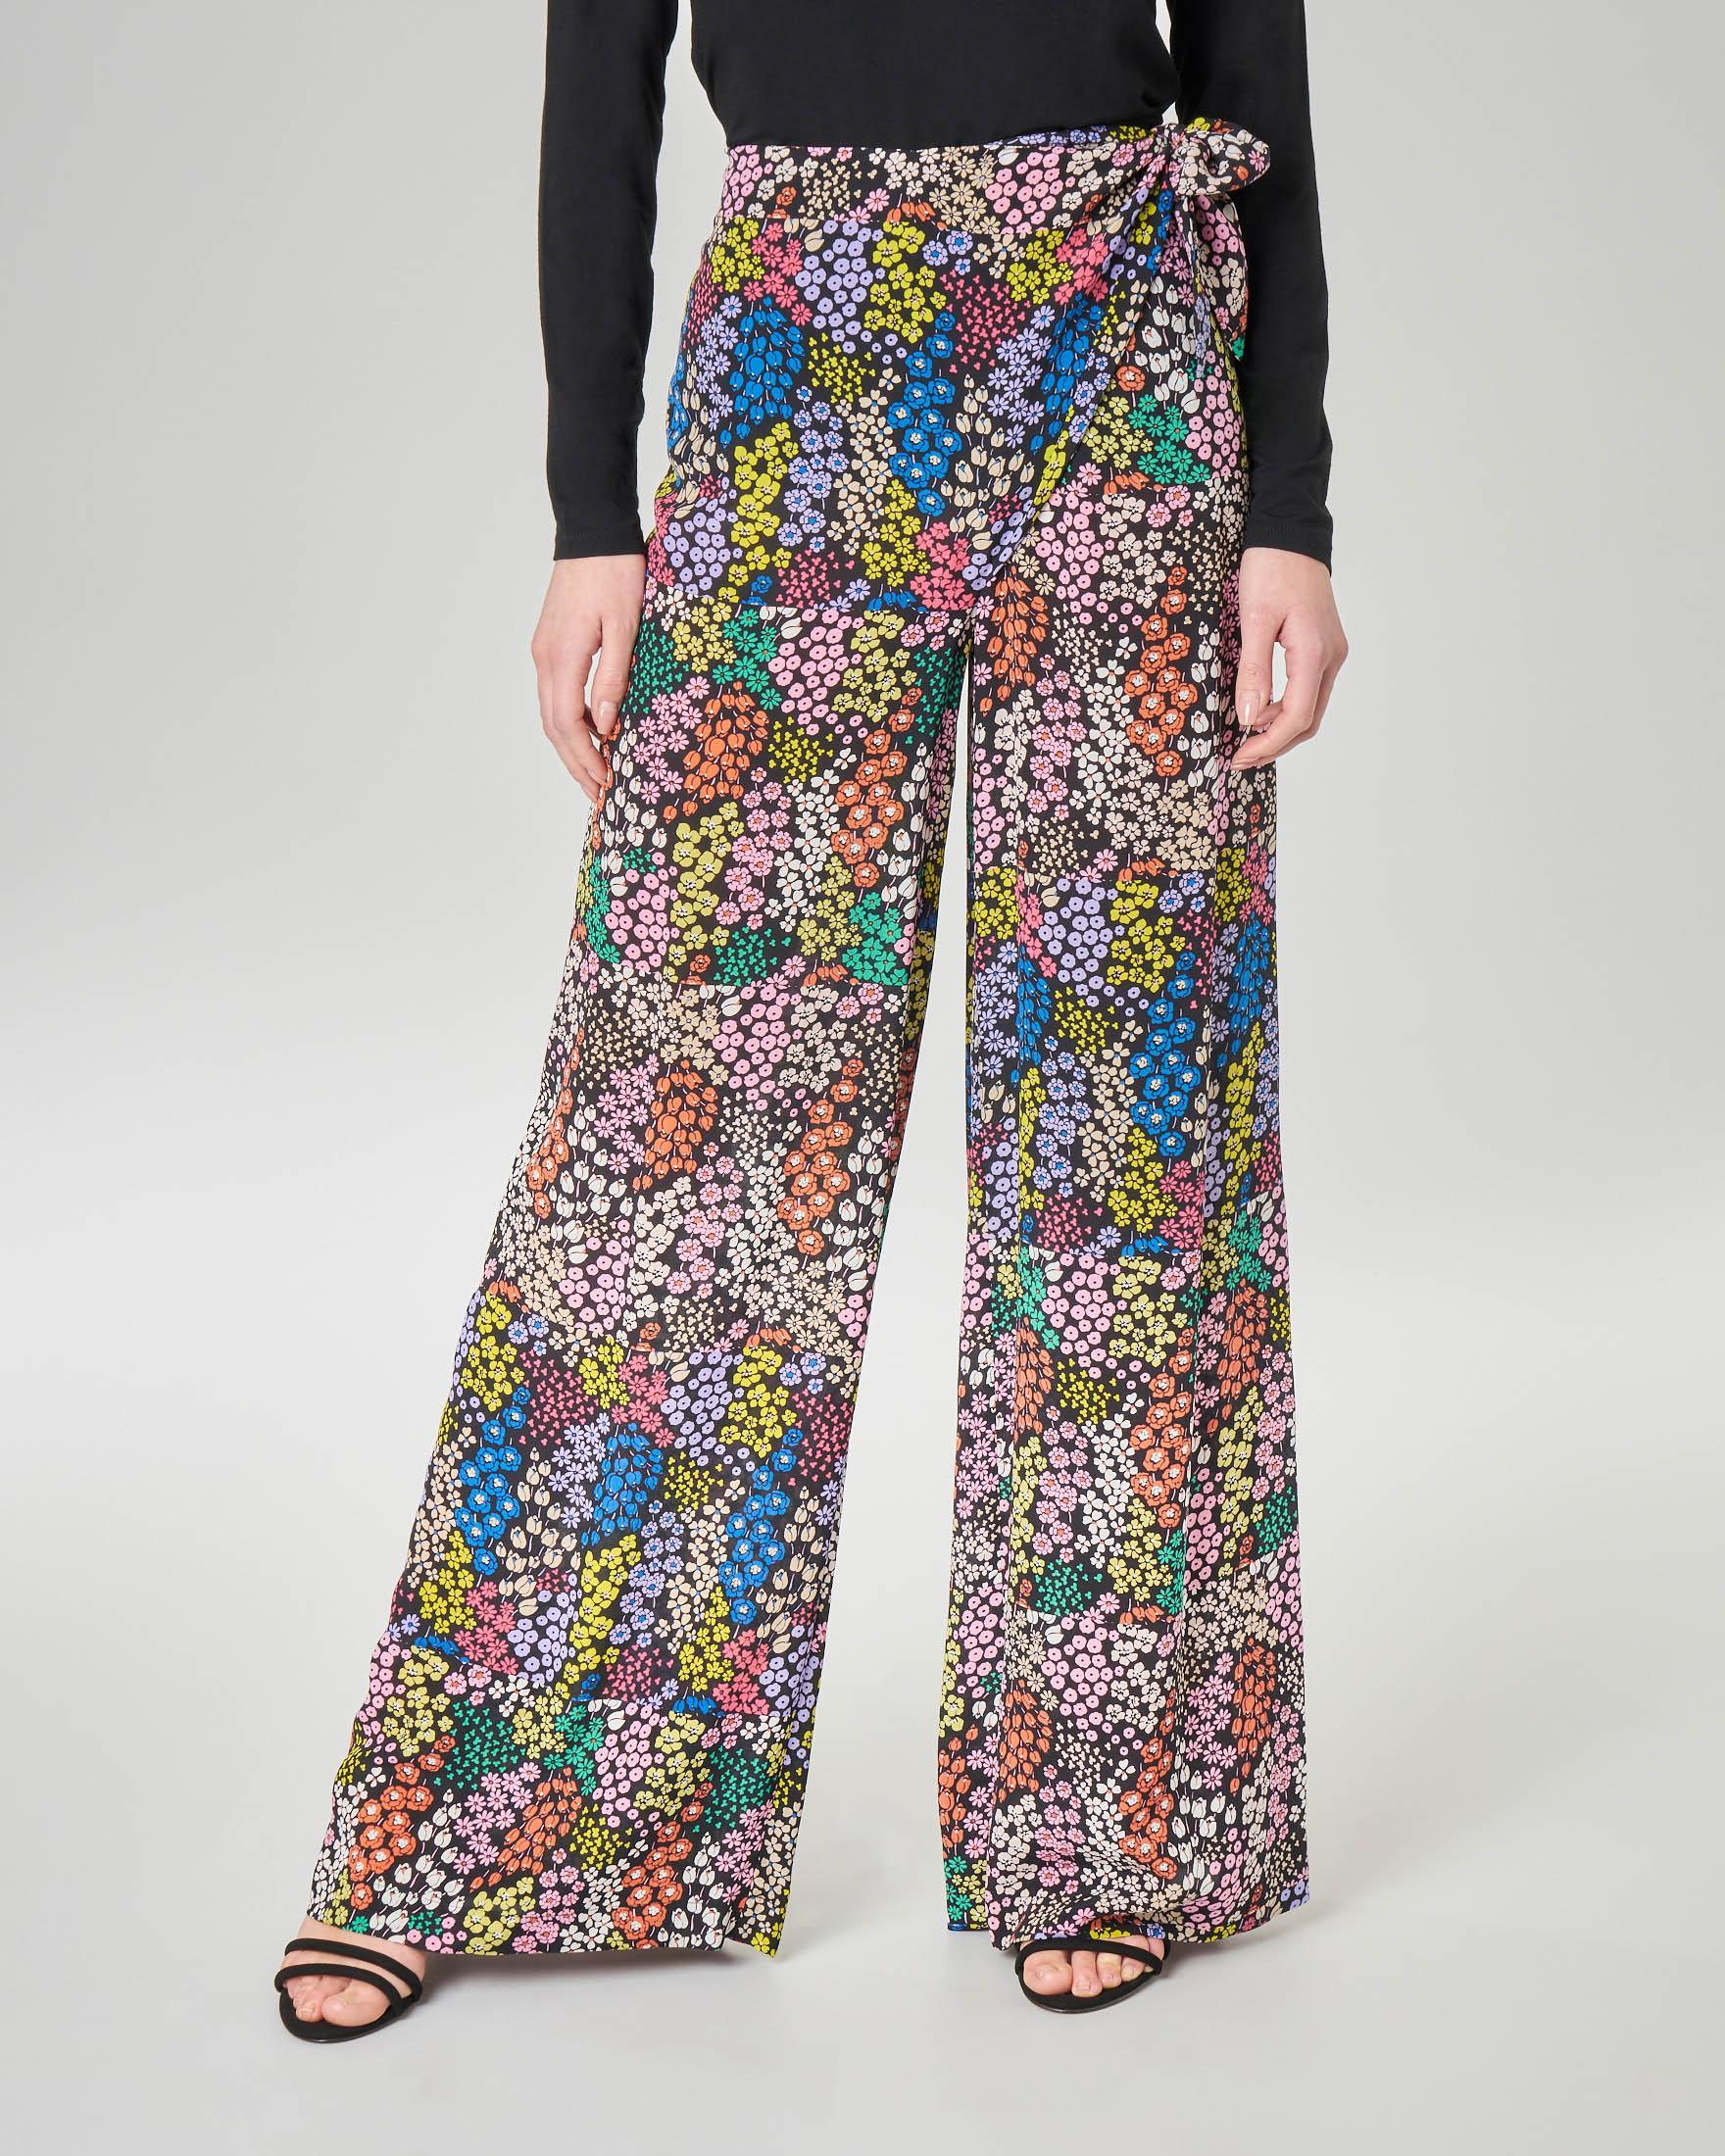 Pantaloni palazzo in seta neri a micro fantasia floreale multicolor